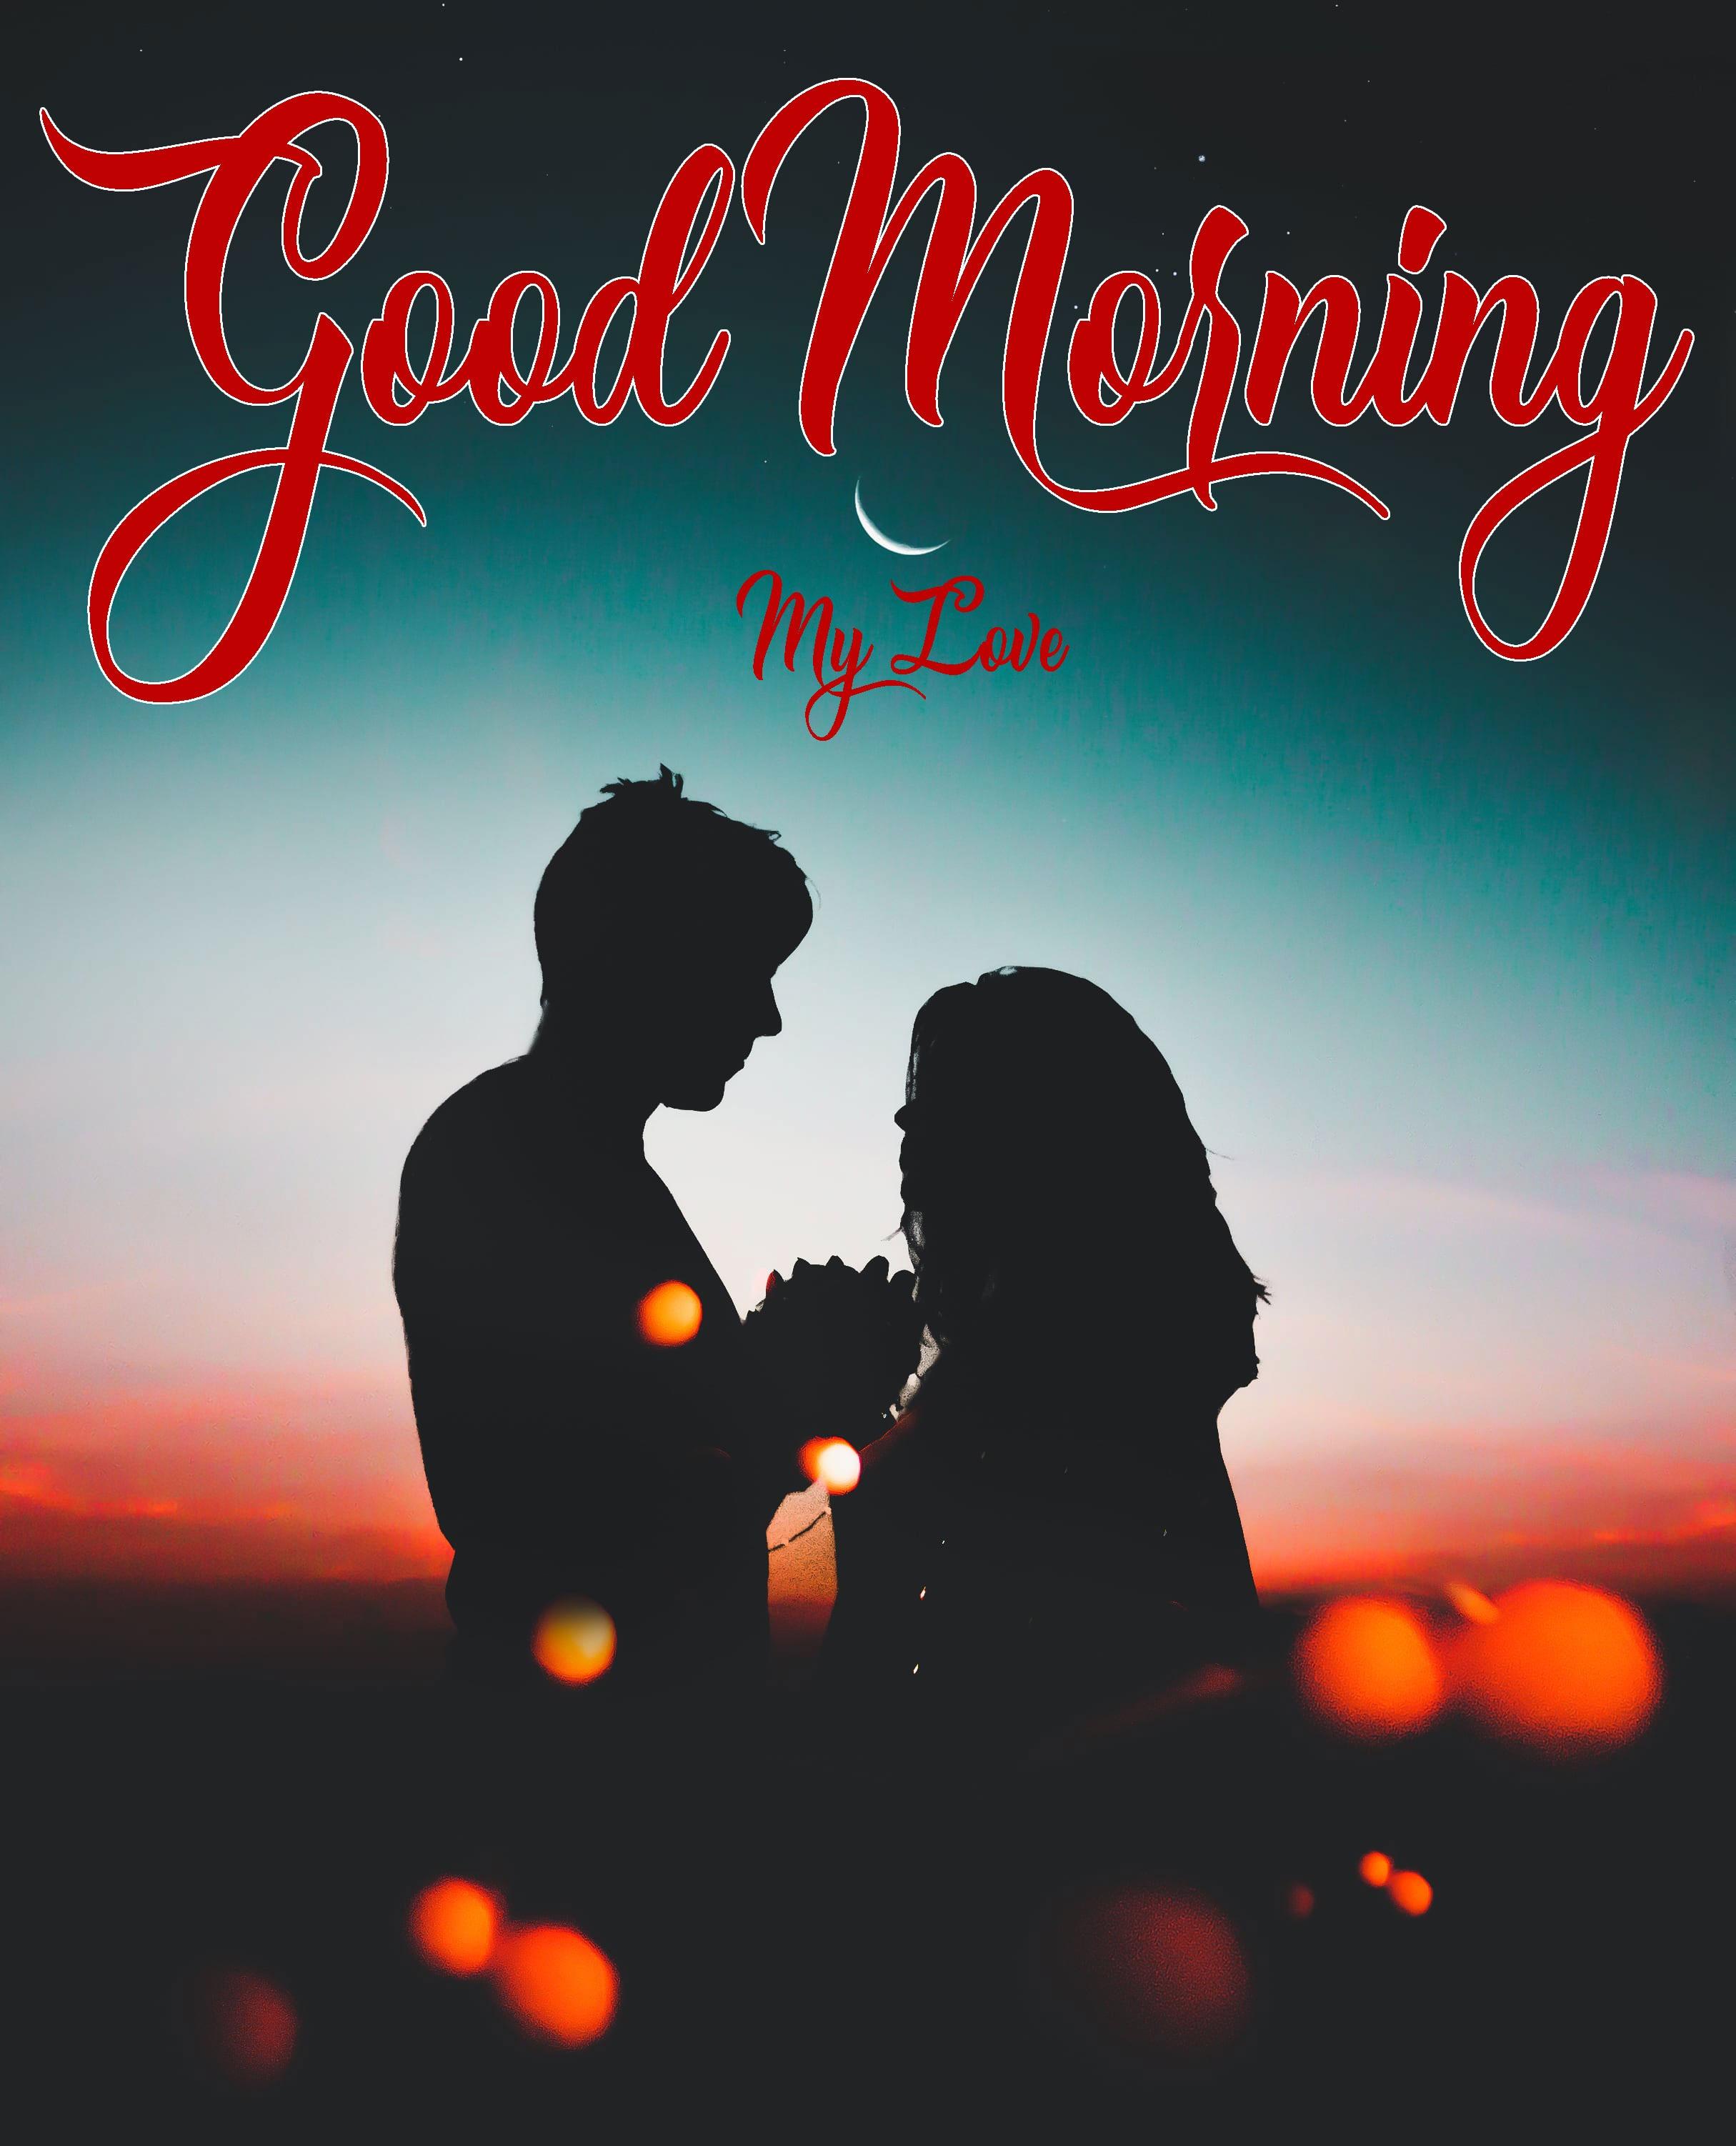 Free HD Beautiful Free Romantic Good Morning Photo